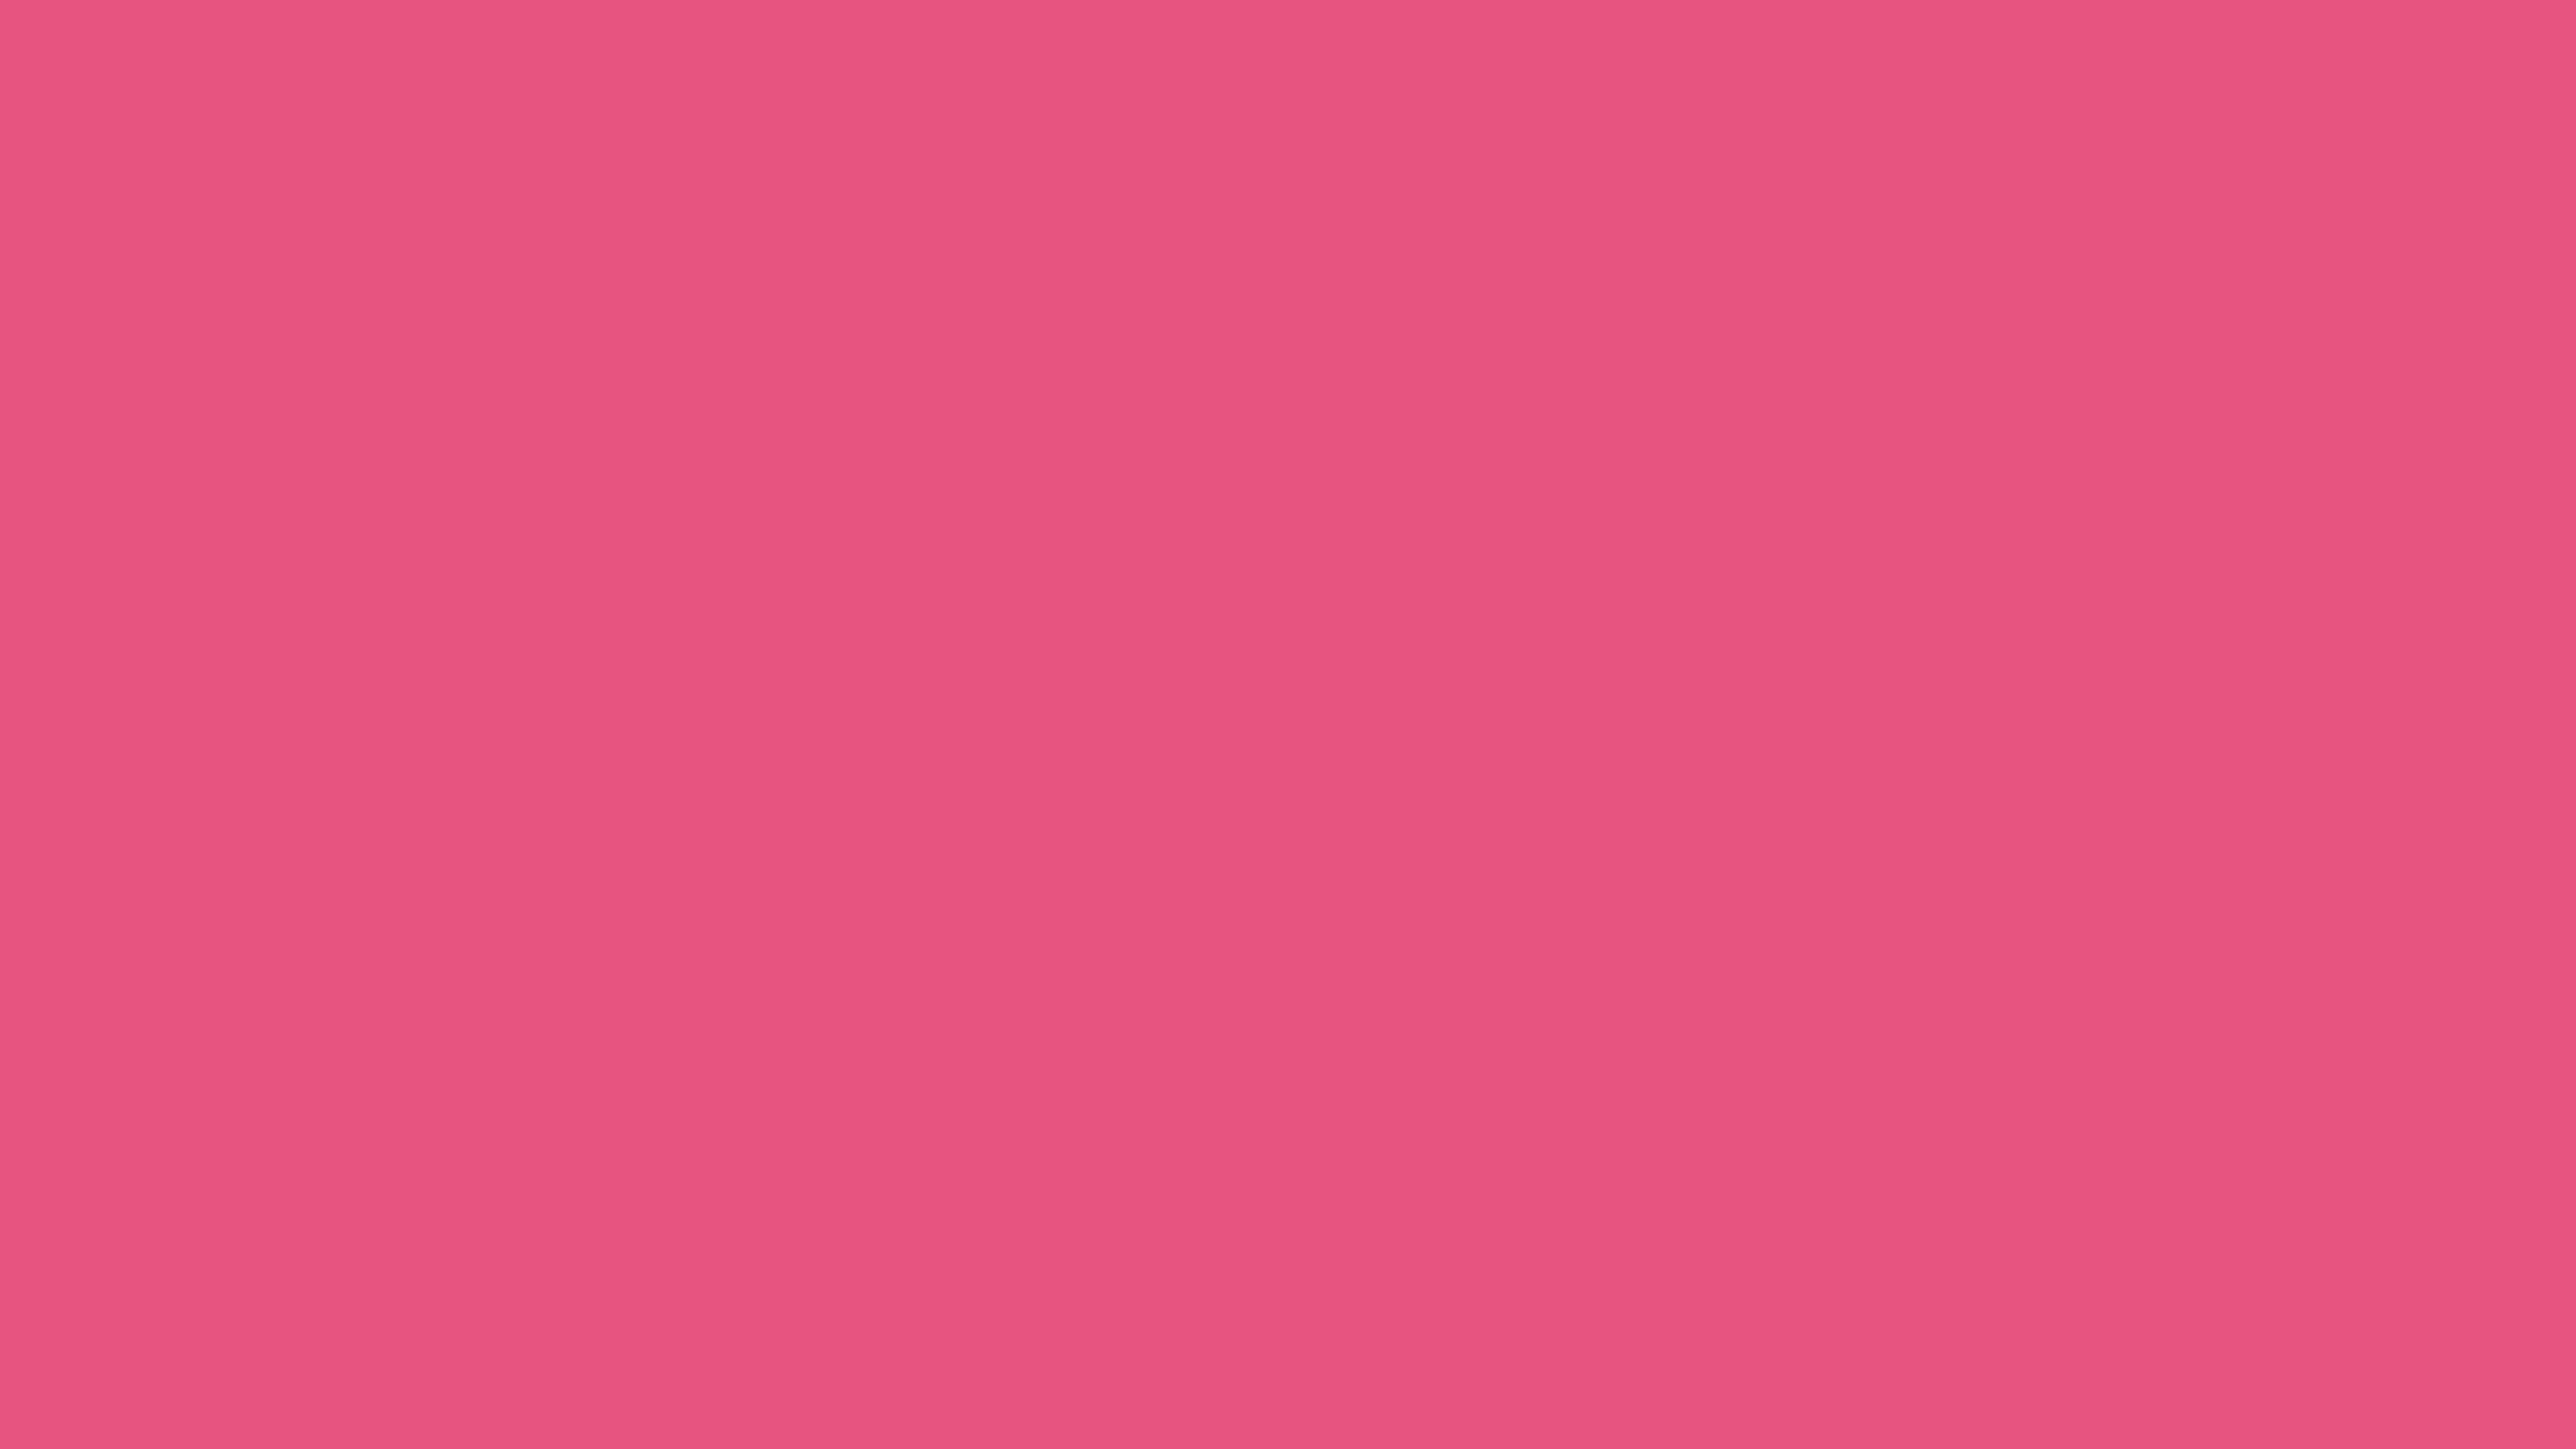 5120x2880 Dark Pink Solid Color Background